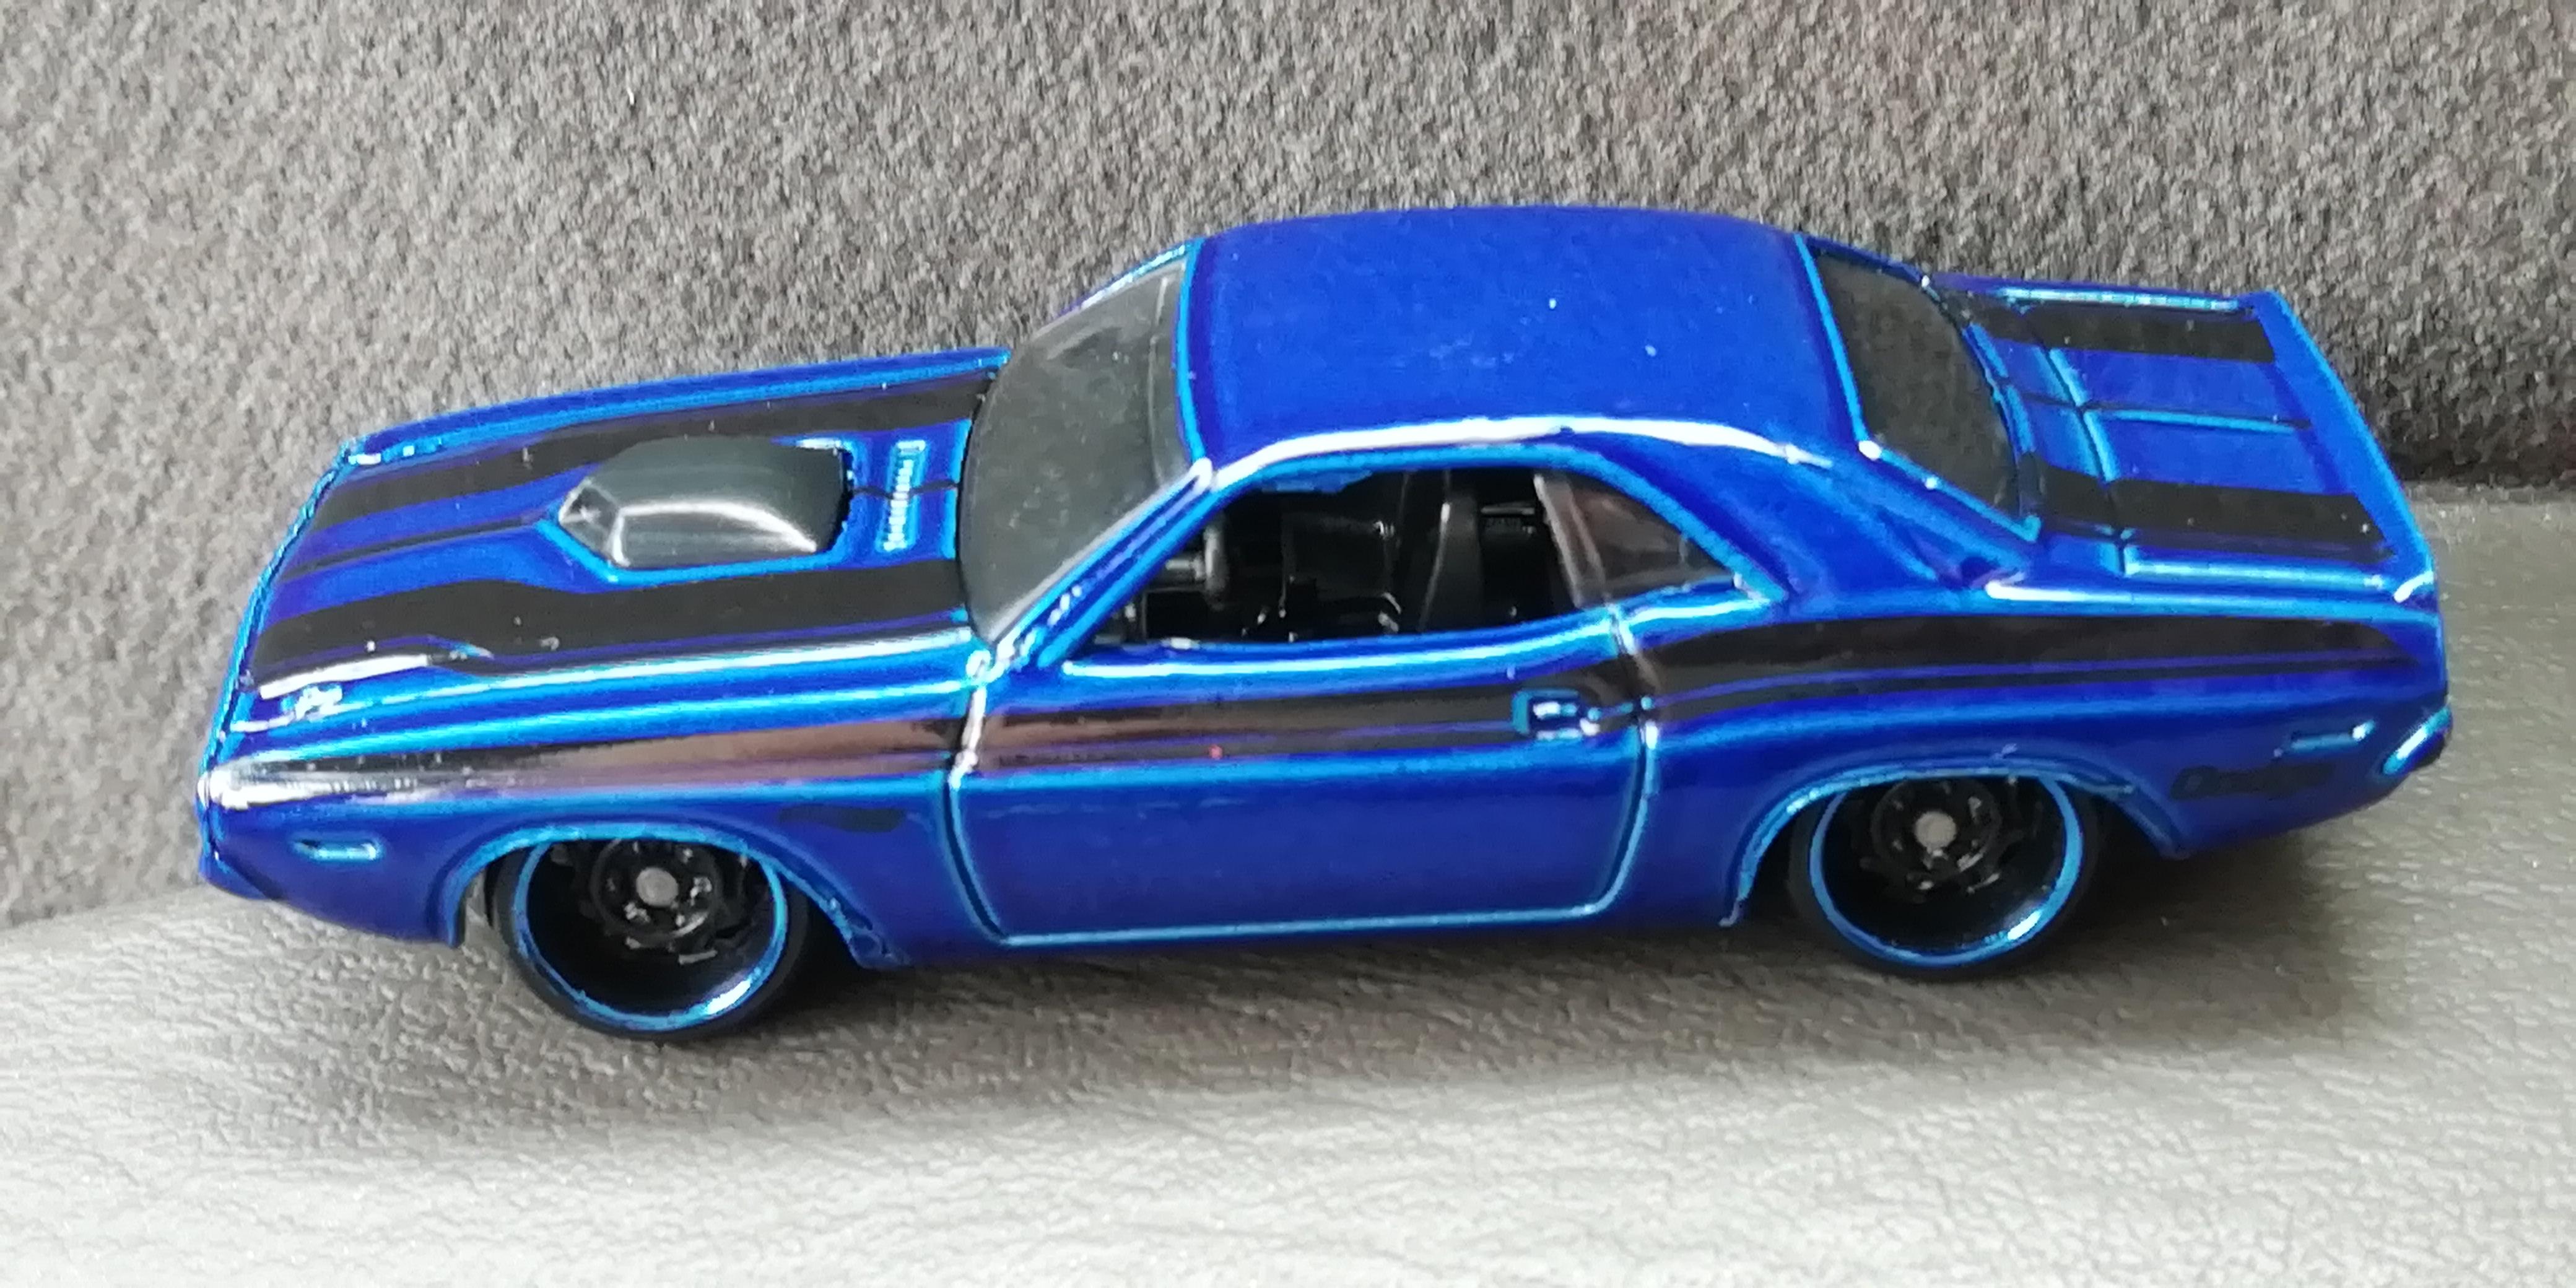 2019 Hot Wheels Multi Pack Exclusive Datsun 240Z blue